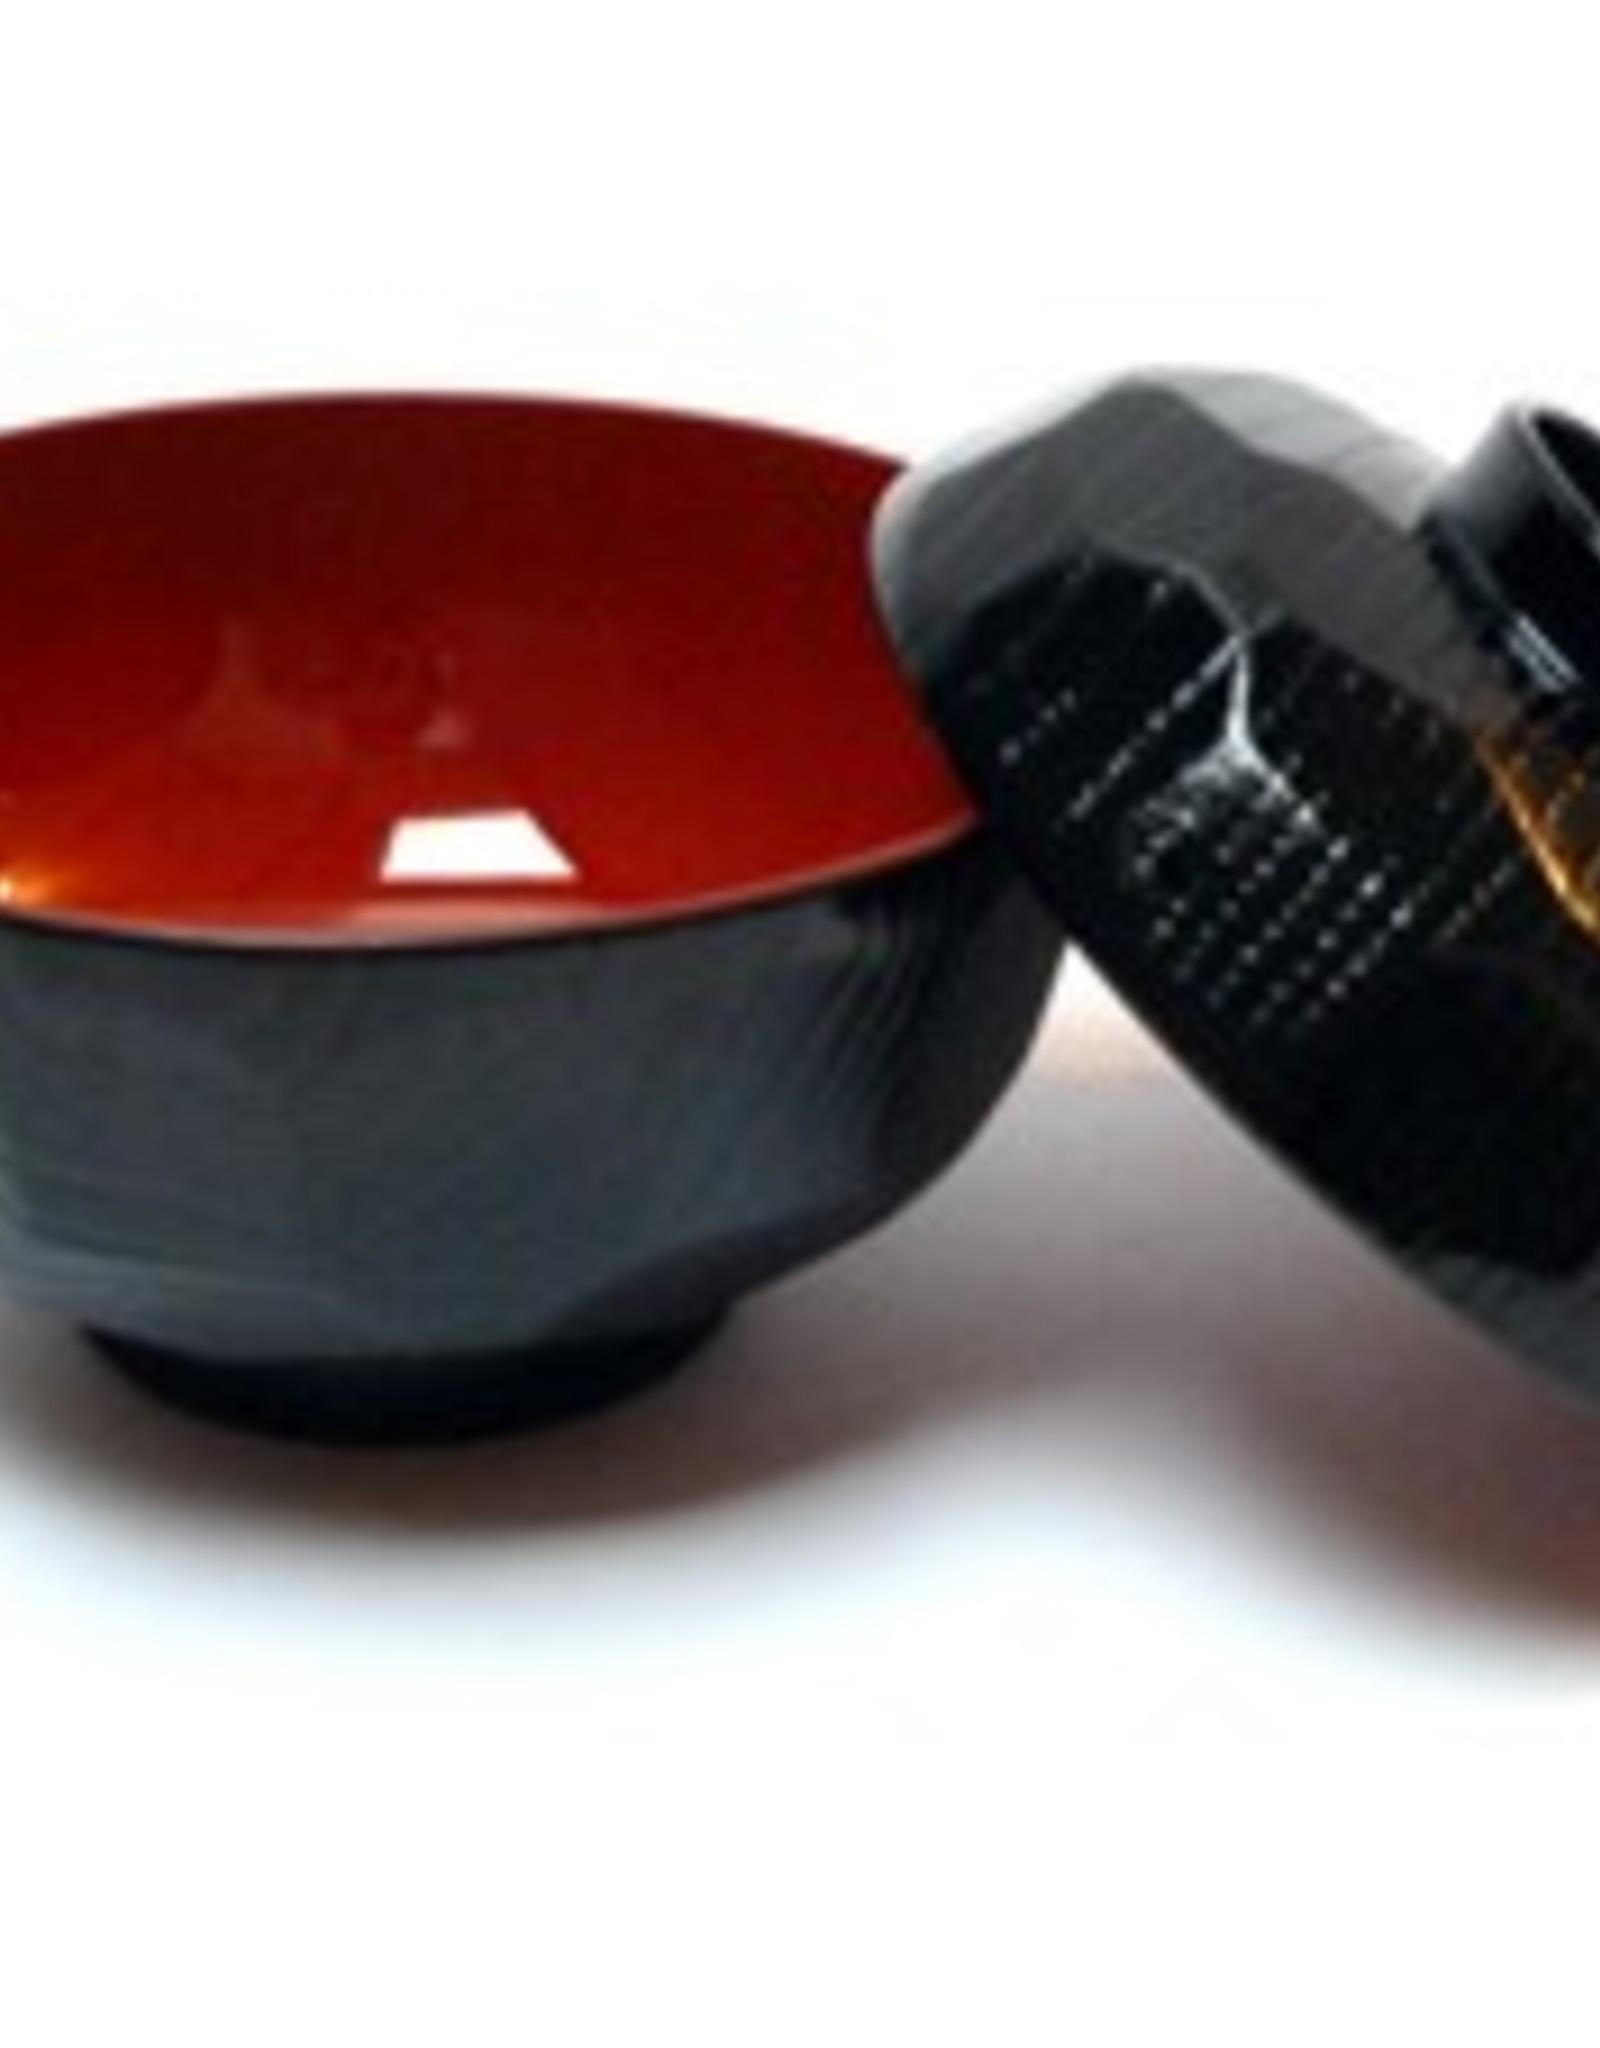 Miso soepkom zwart rood groot